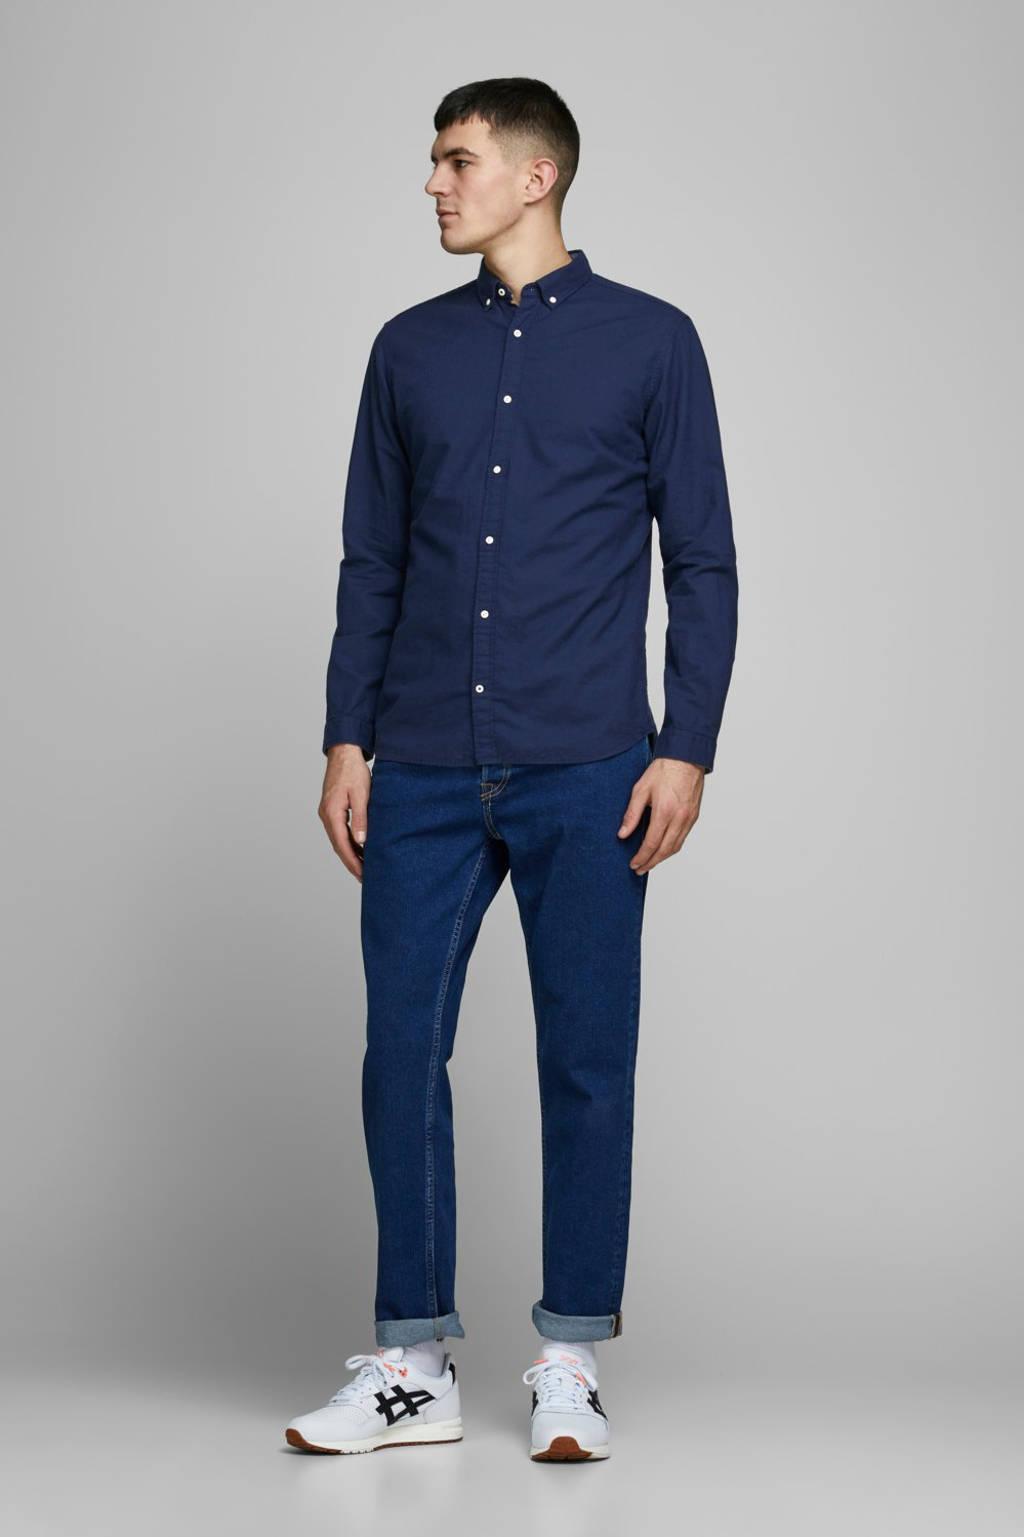 JACK & JONES ESSENTIALS slim fit overhemd donkerblauw, Donkerblauw